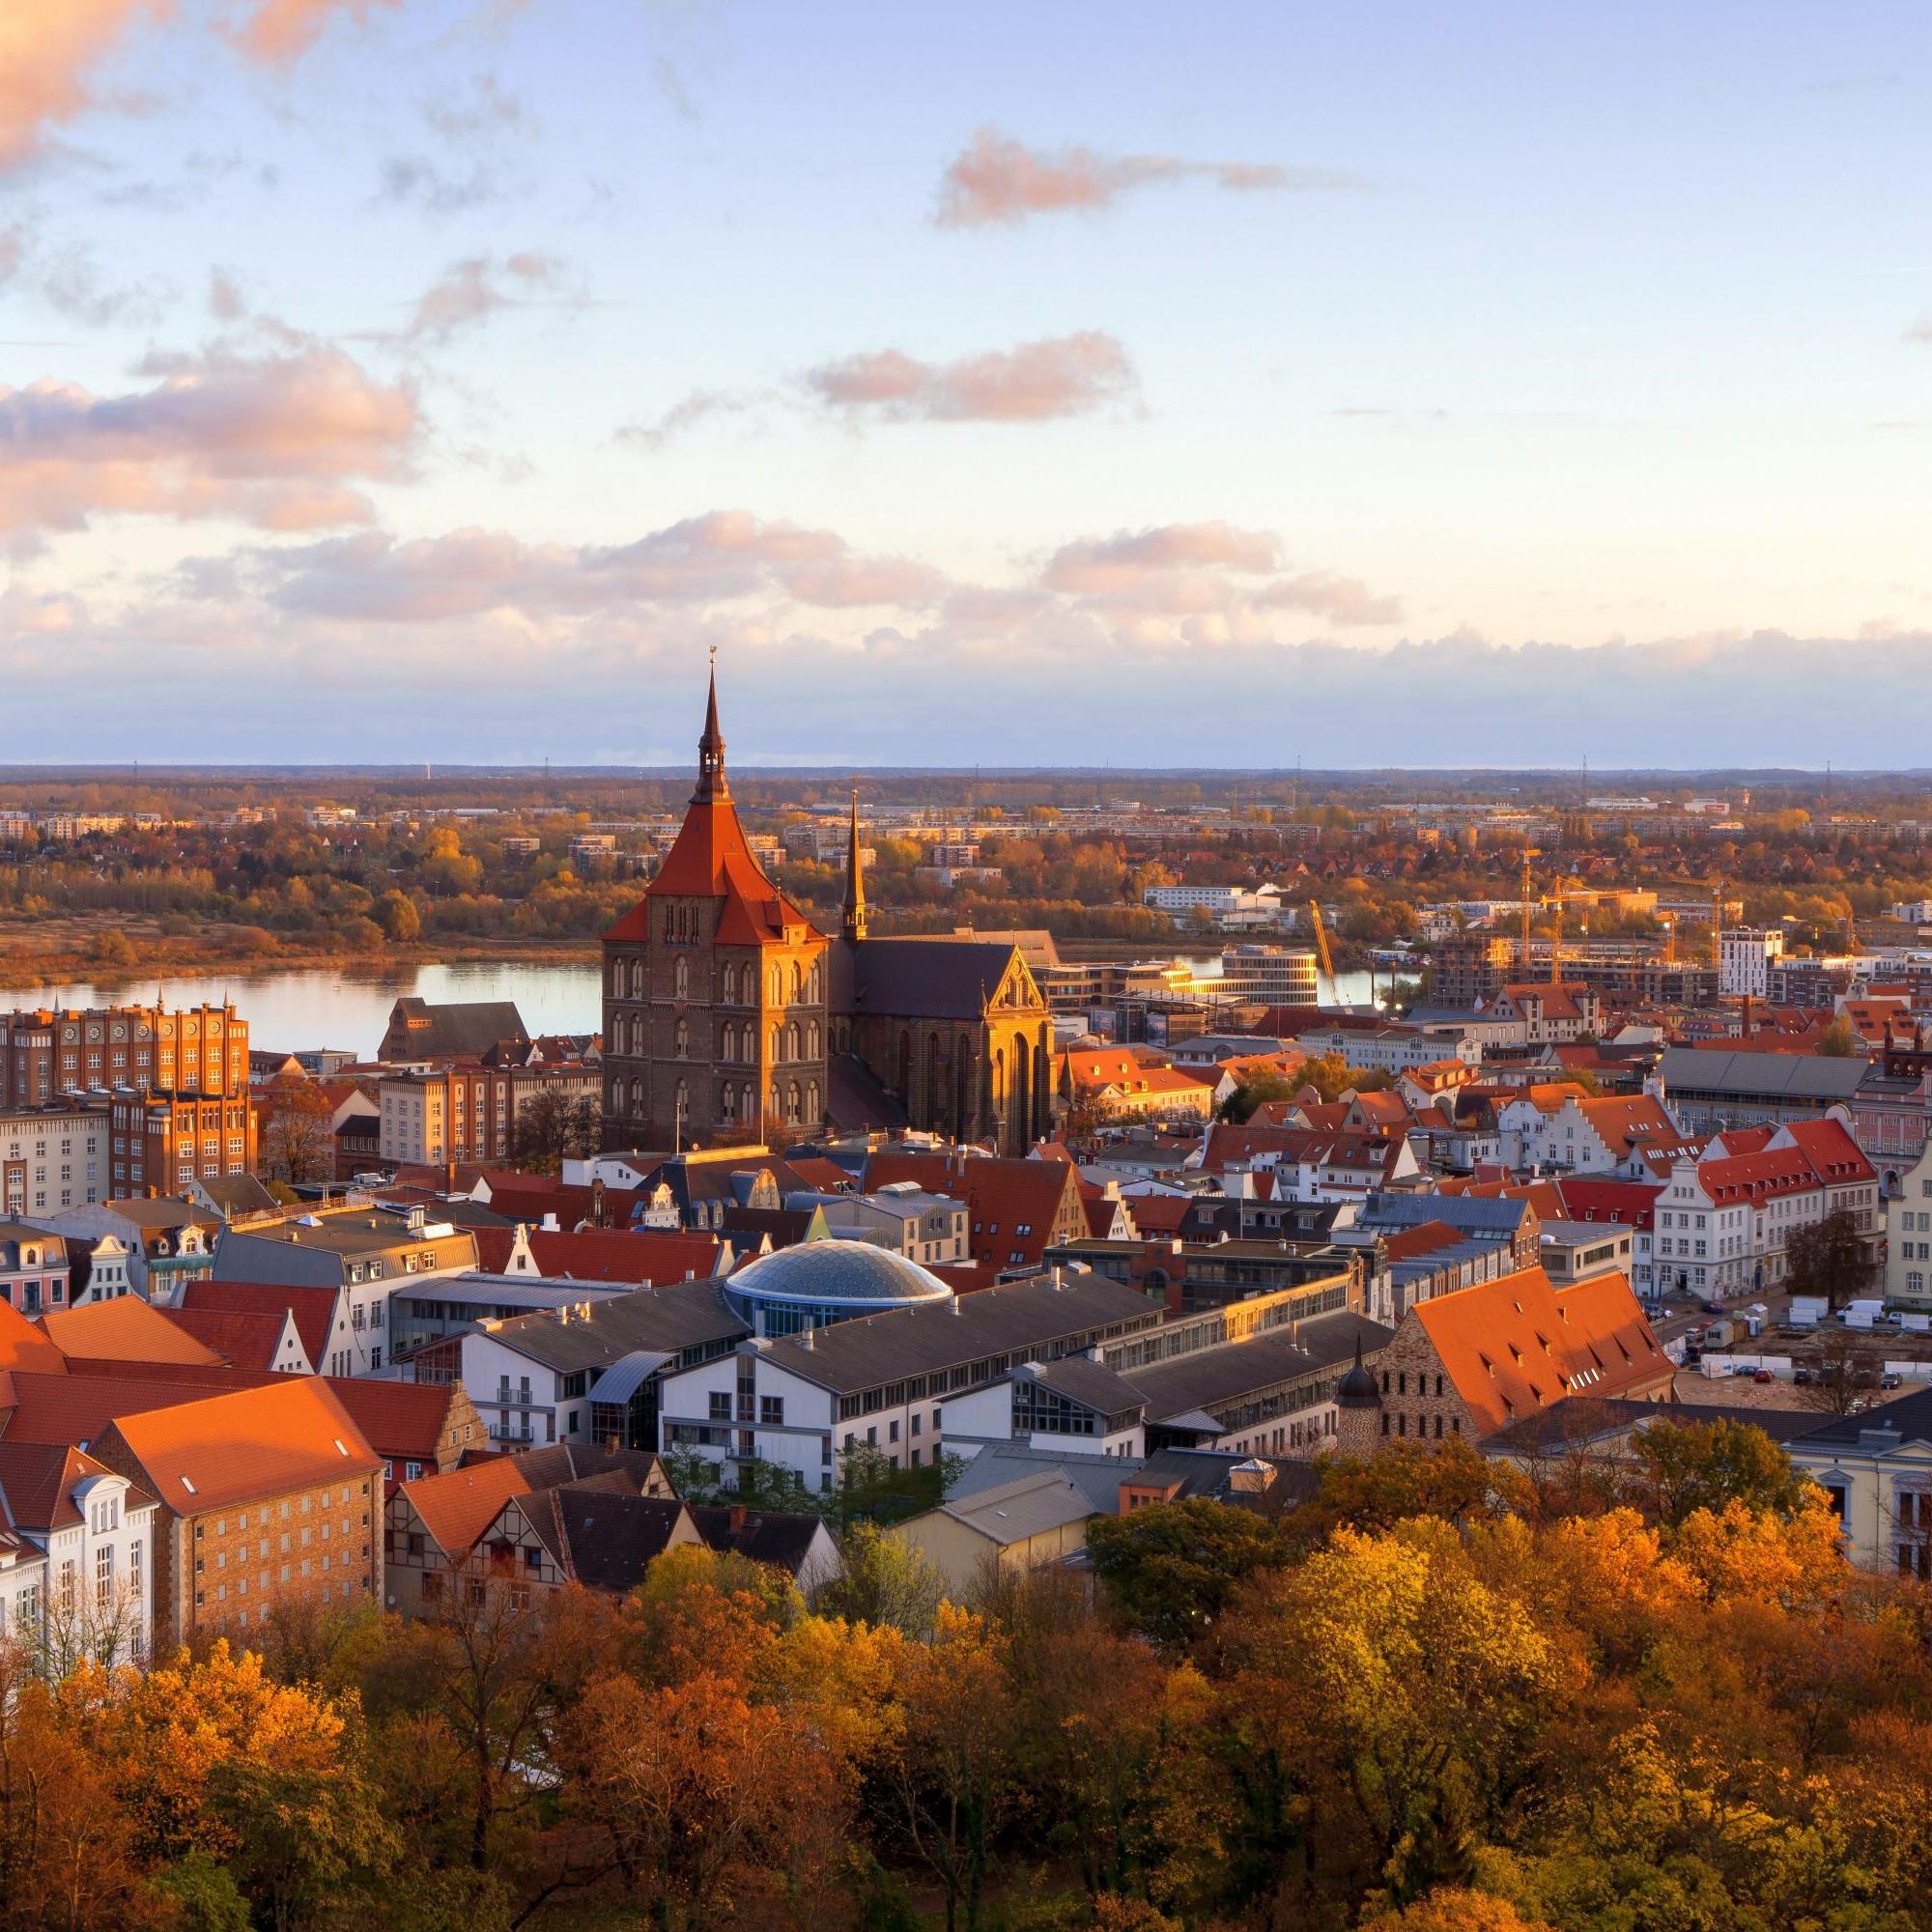 Blick auf Rostock im Herbst.